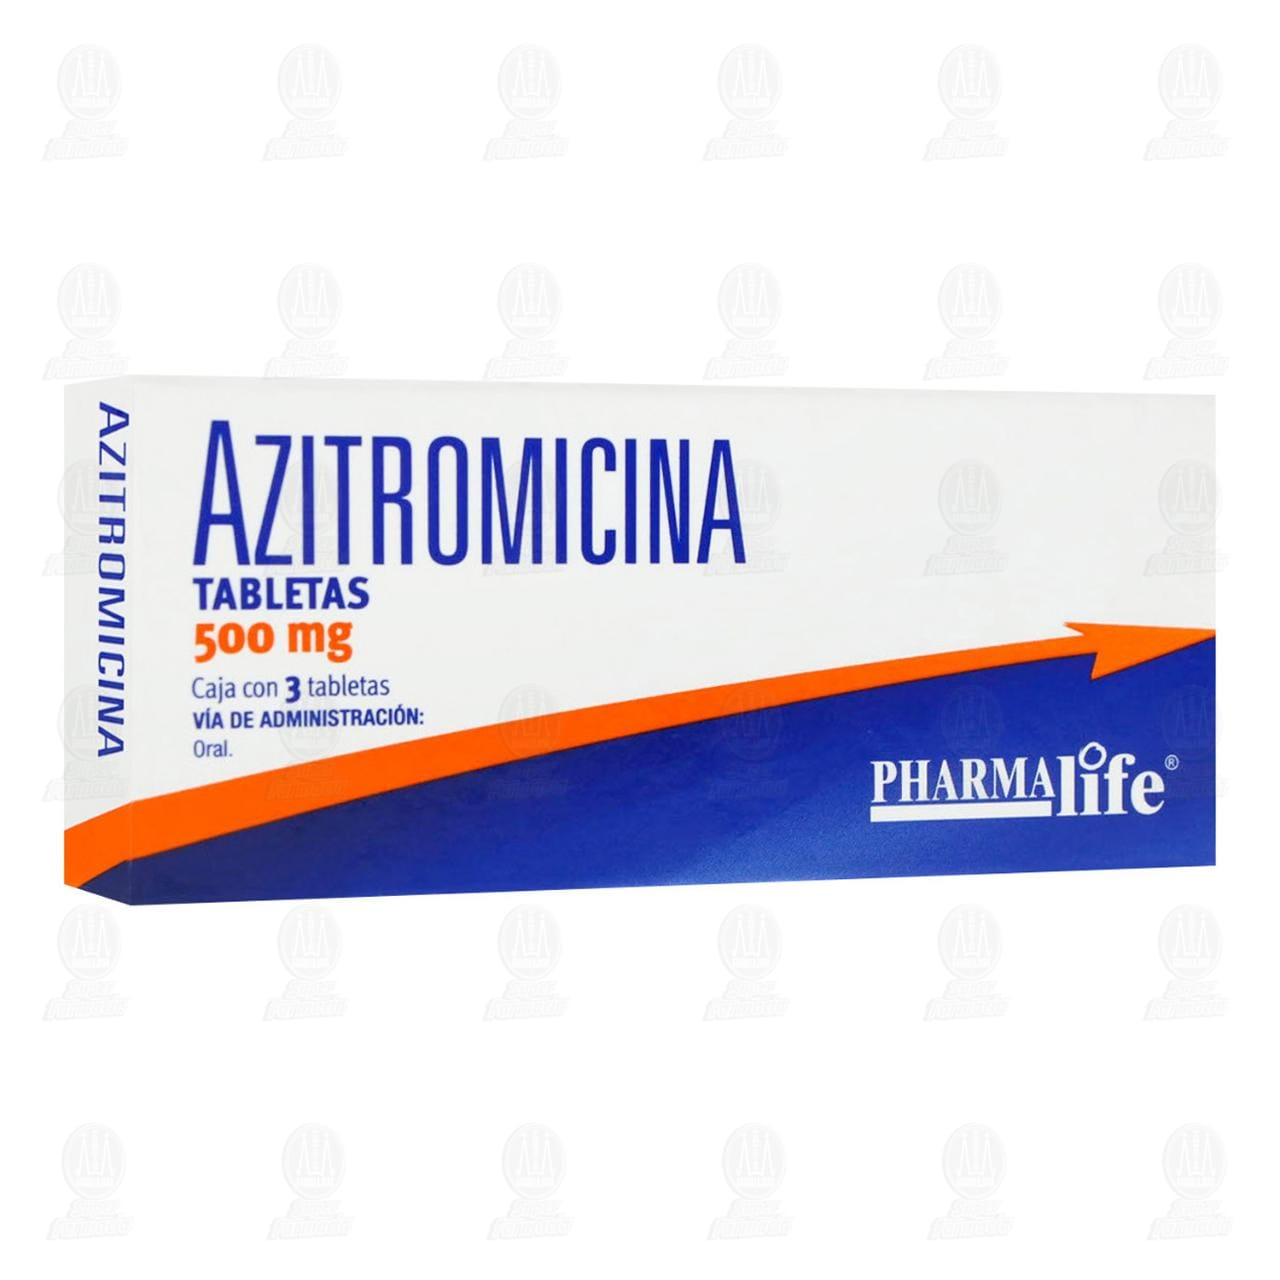 Comprar Azitromicina 500mg 3 Tabletas Pharmalife en Farmacias Guadalajara